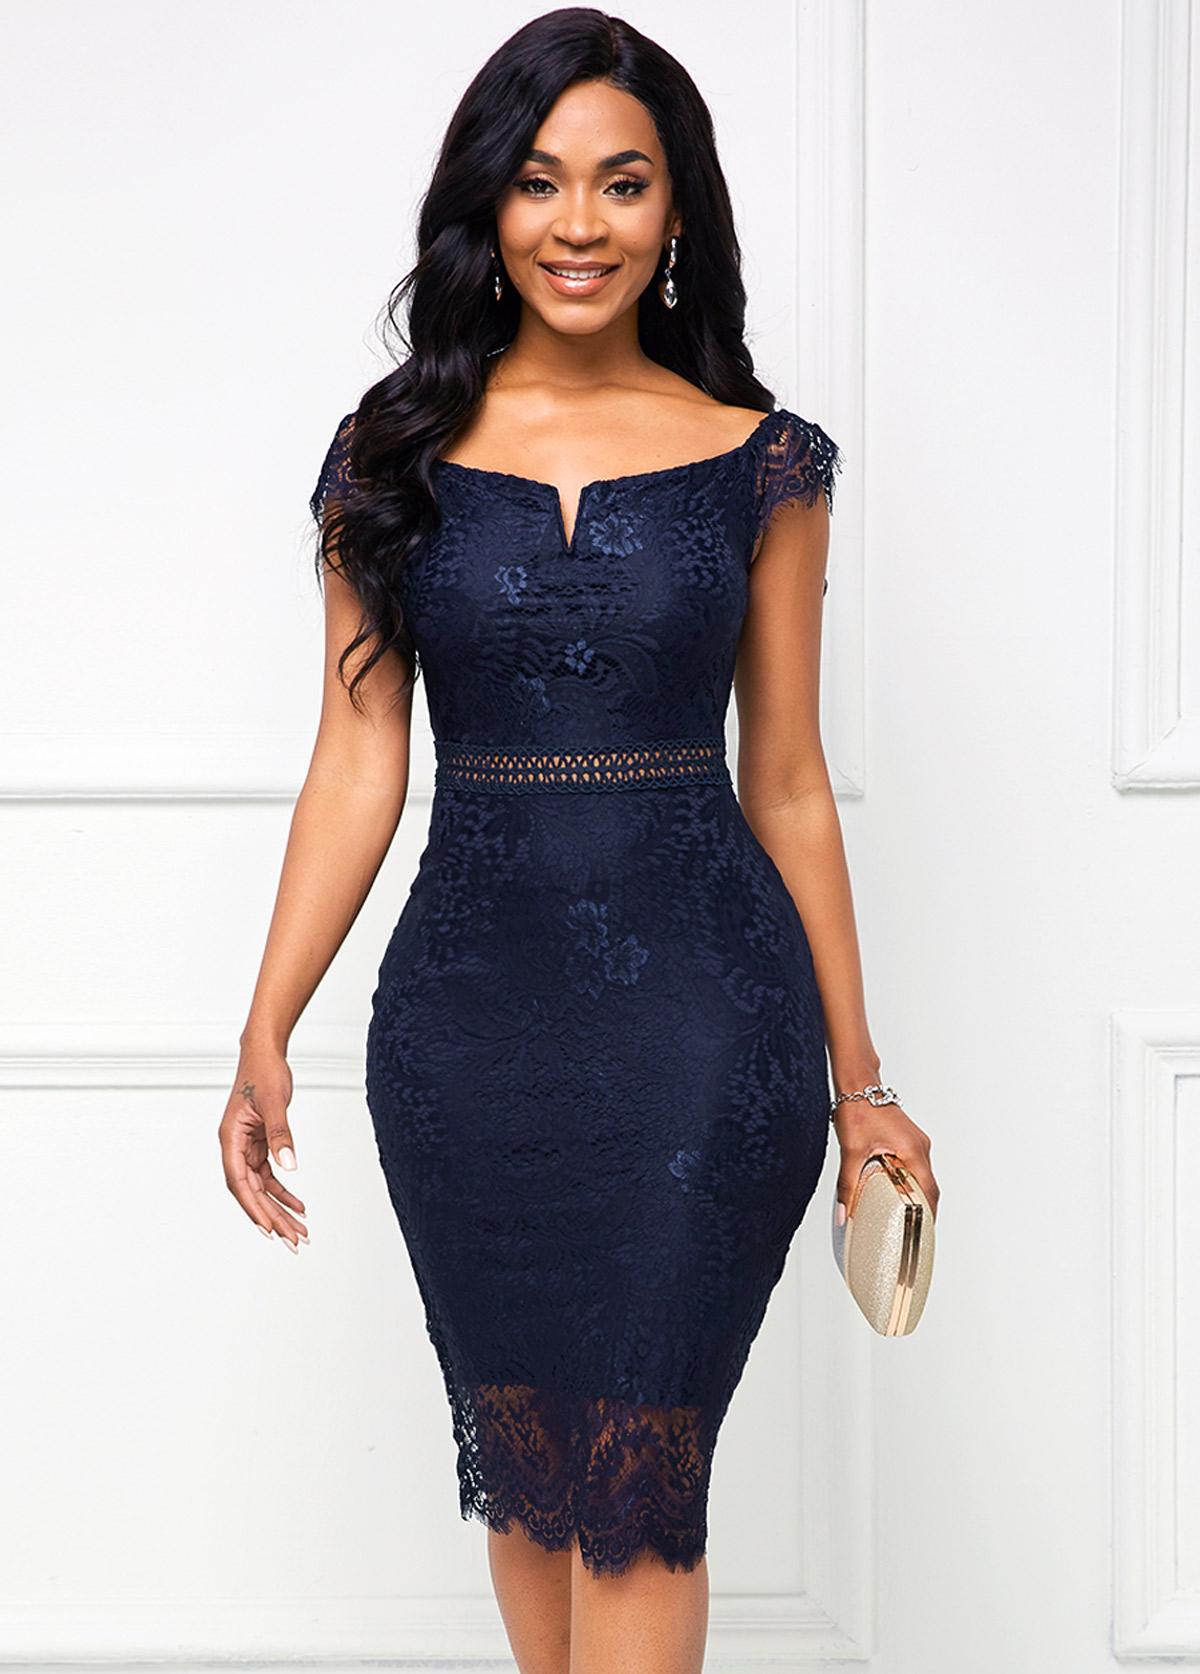 Lace Cap Sleeve Navy Blue Bodycon Dress